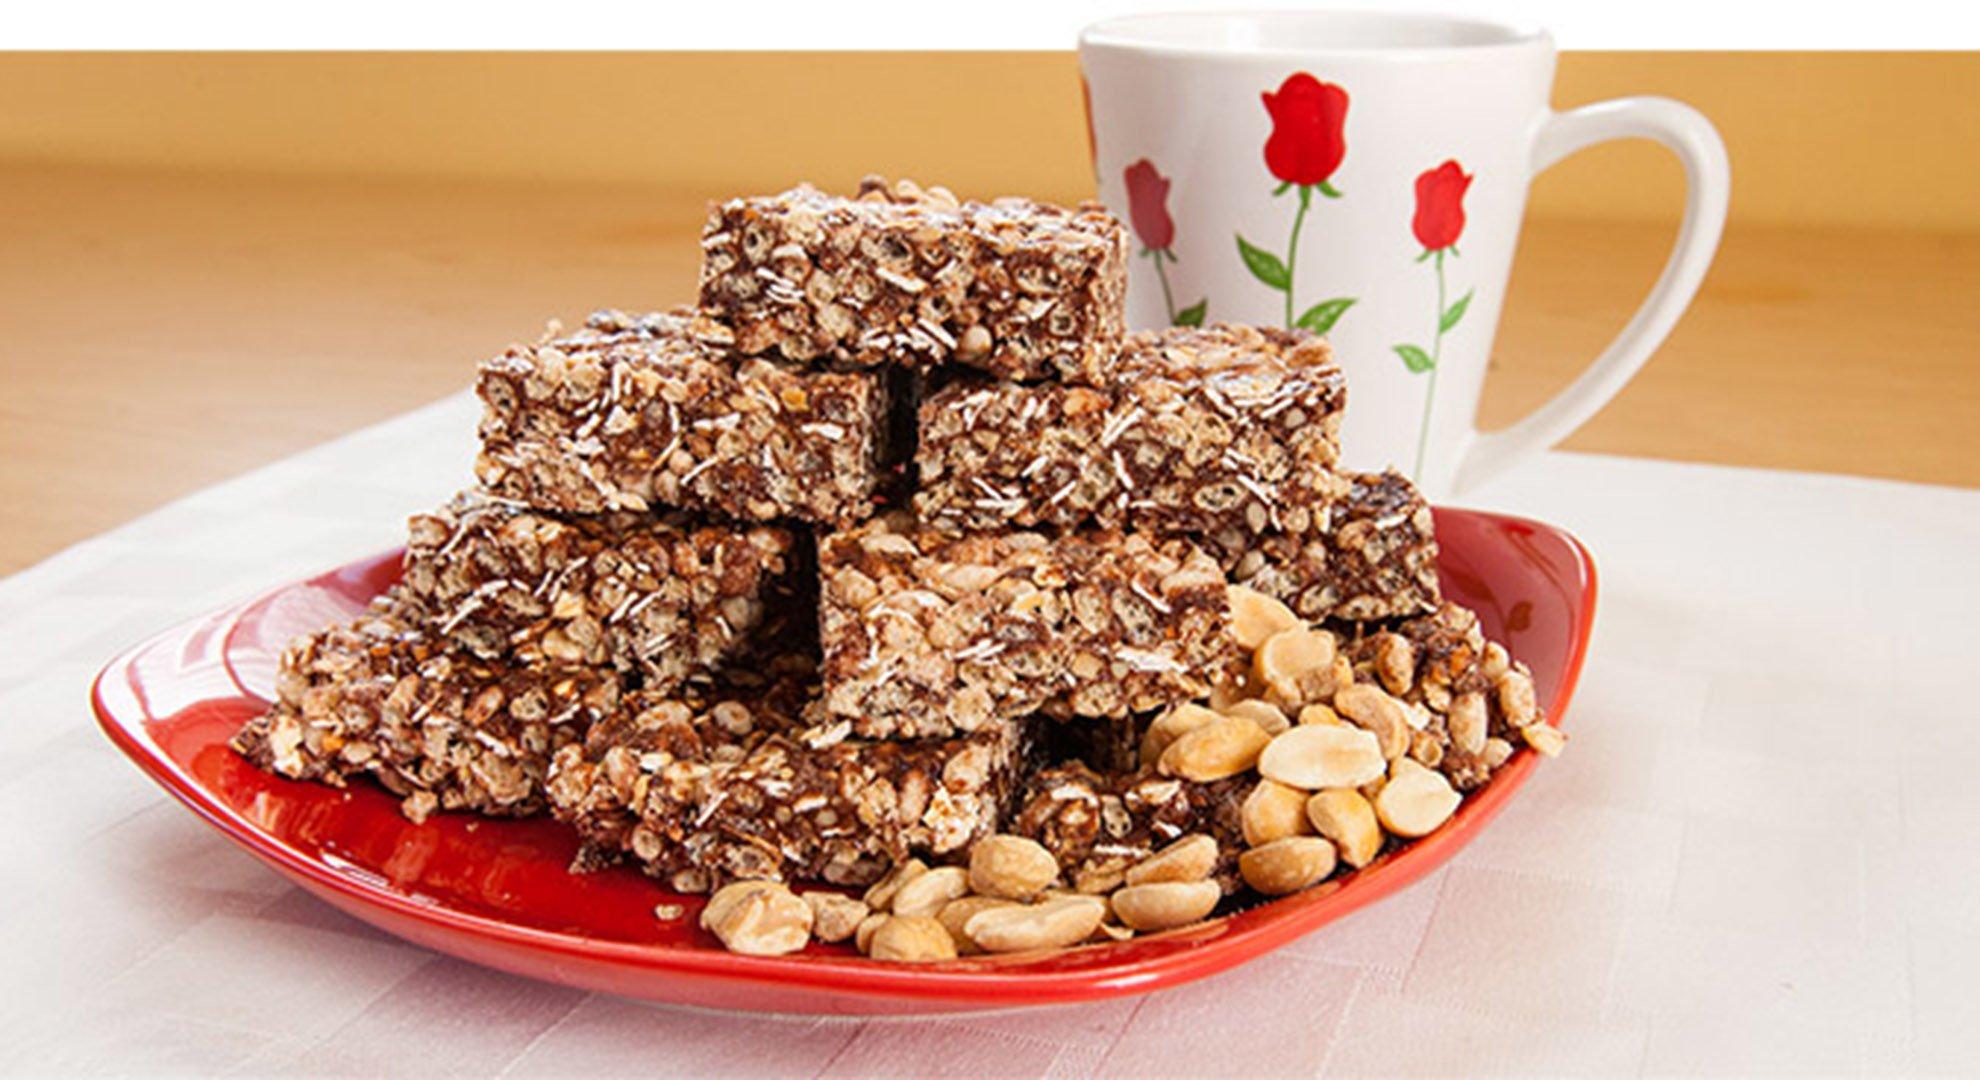 Jamie Eason's Chocolate Peanut Butter Protein Crisp